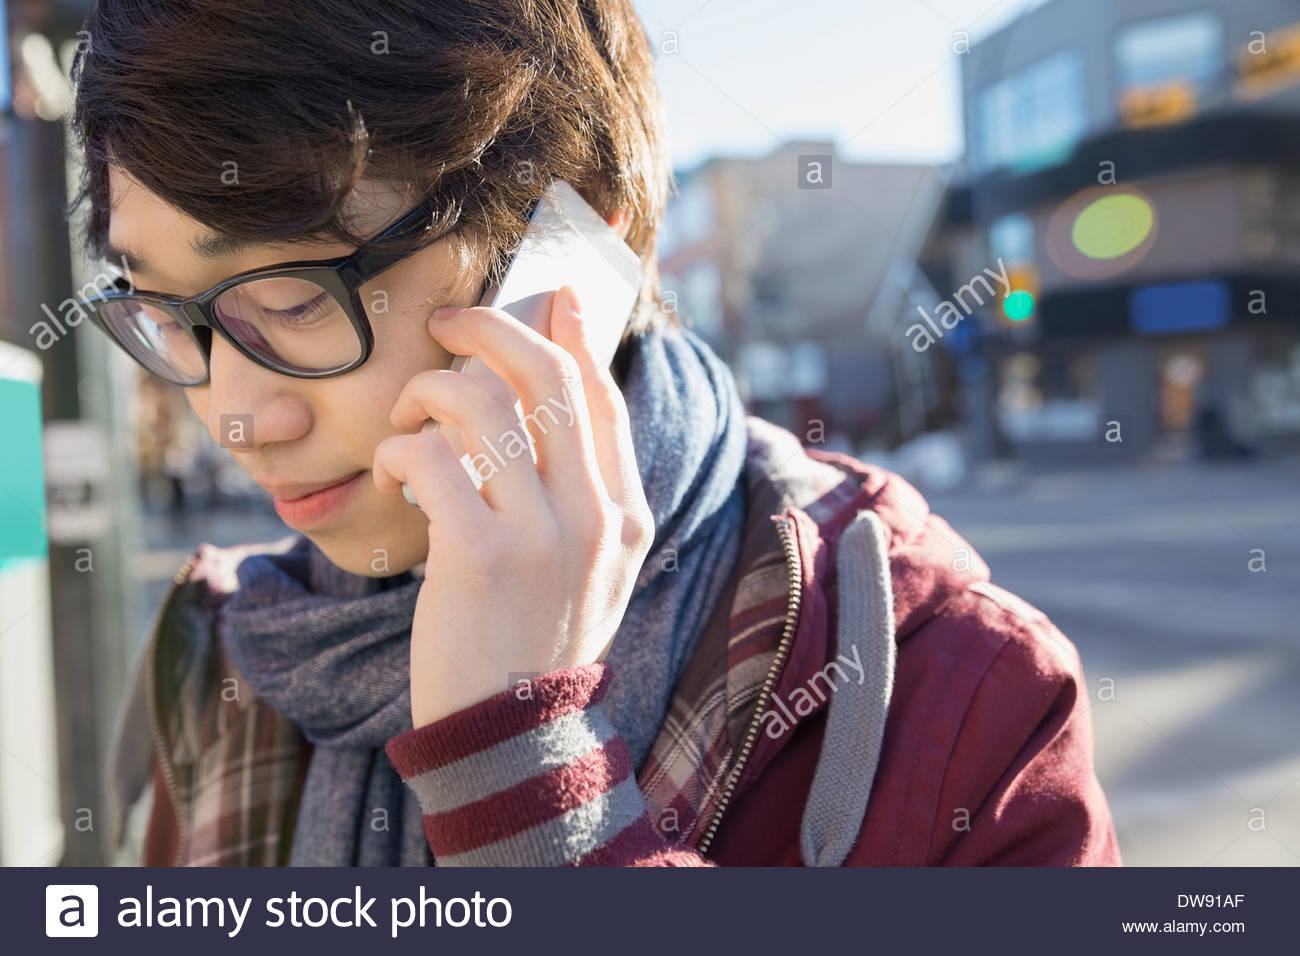 Junger Mann am Smartphone im freien sprechen Stockbild